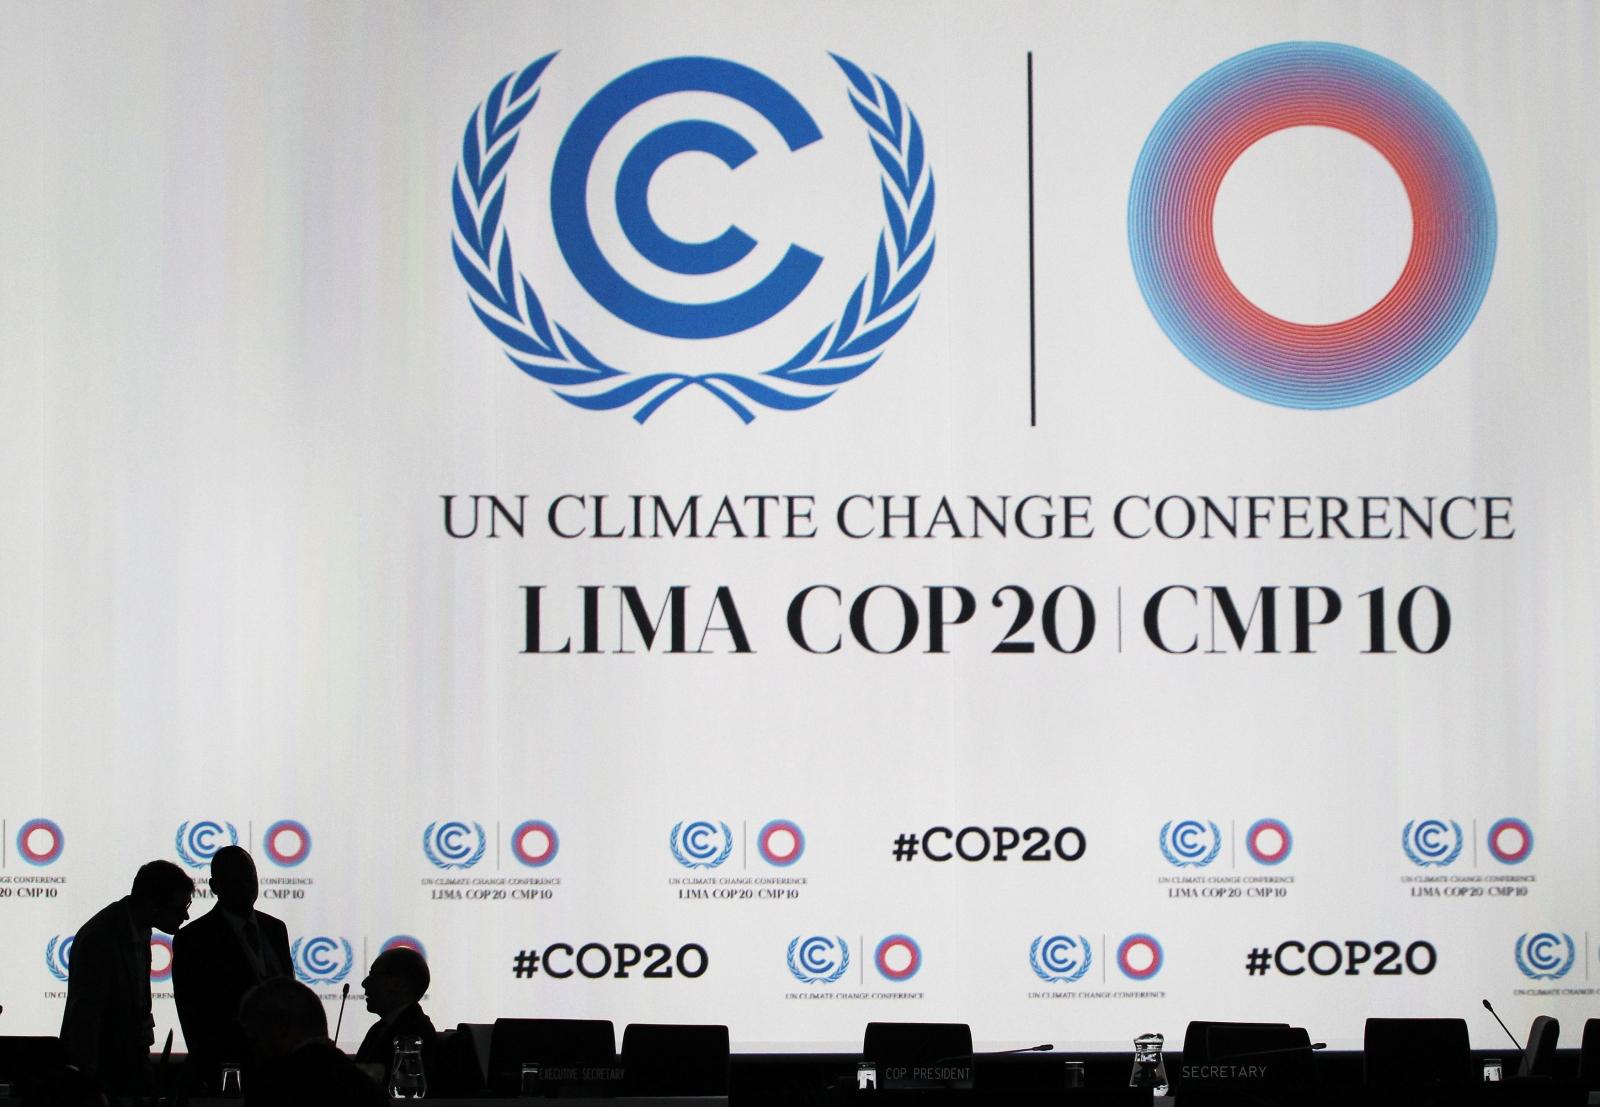 UN climate change talks in Lima, Peru